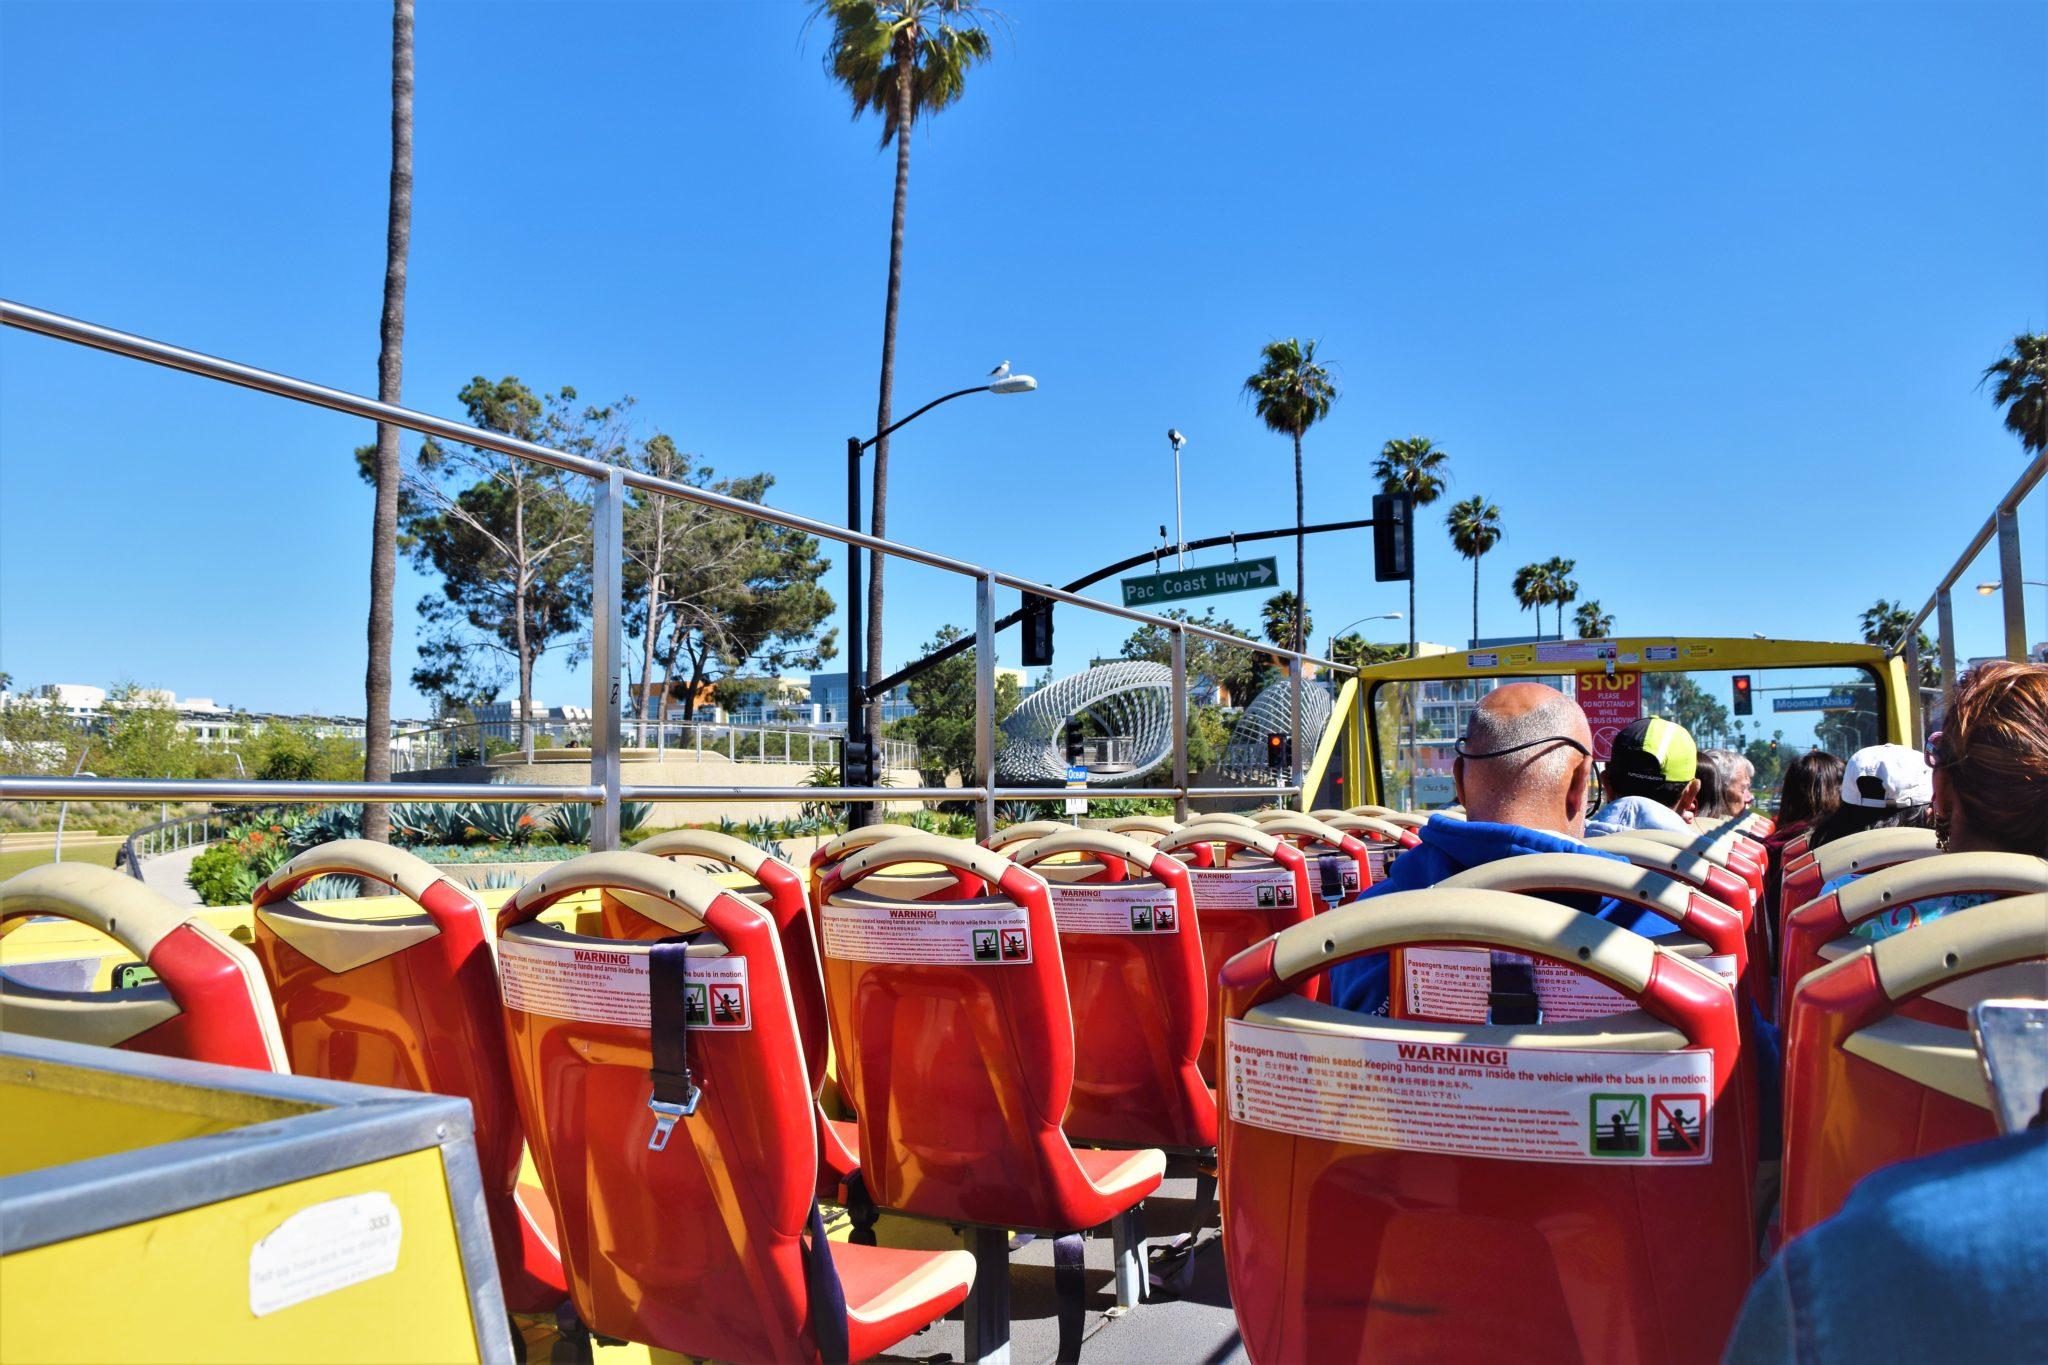 Moomat Ahitko Santa Monica Park